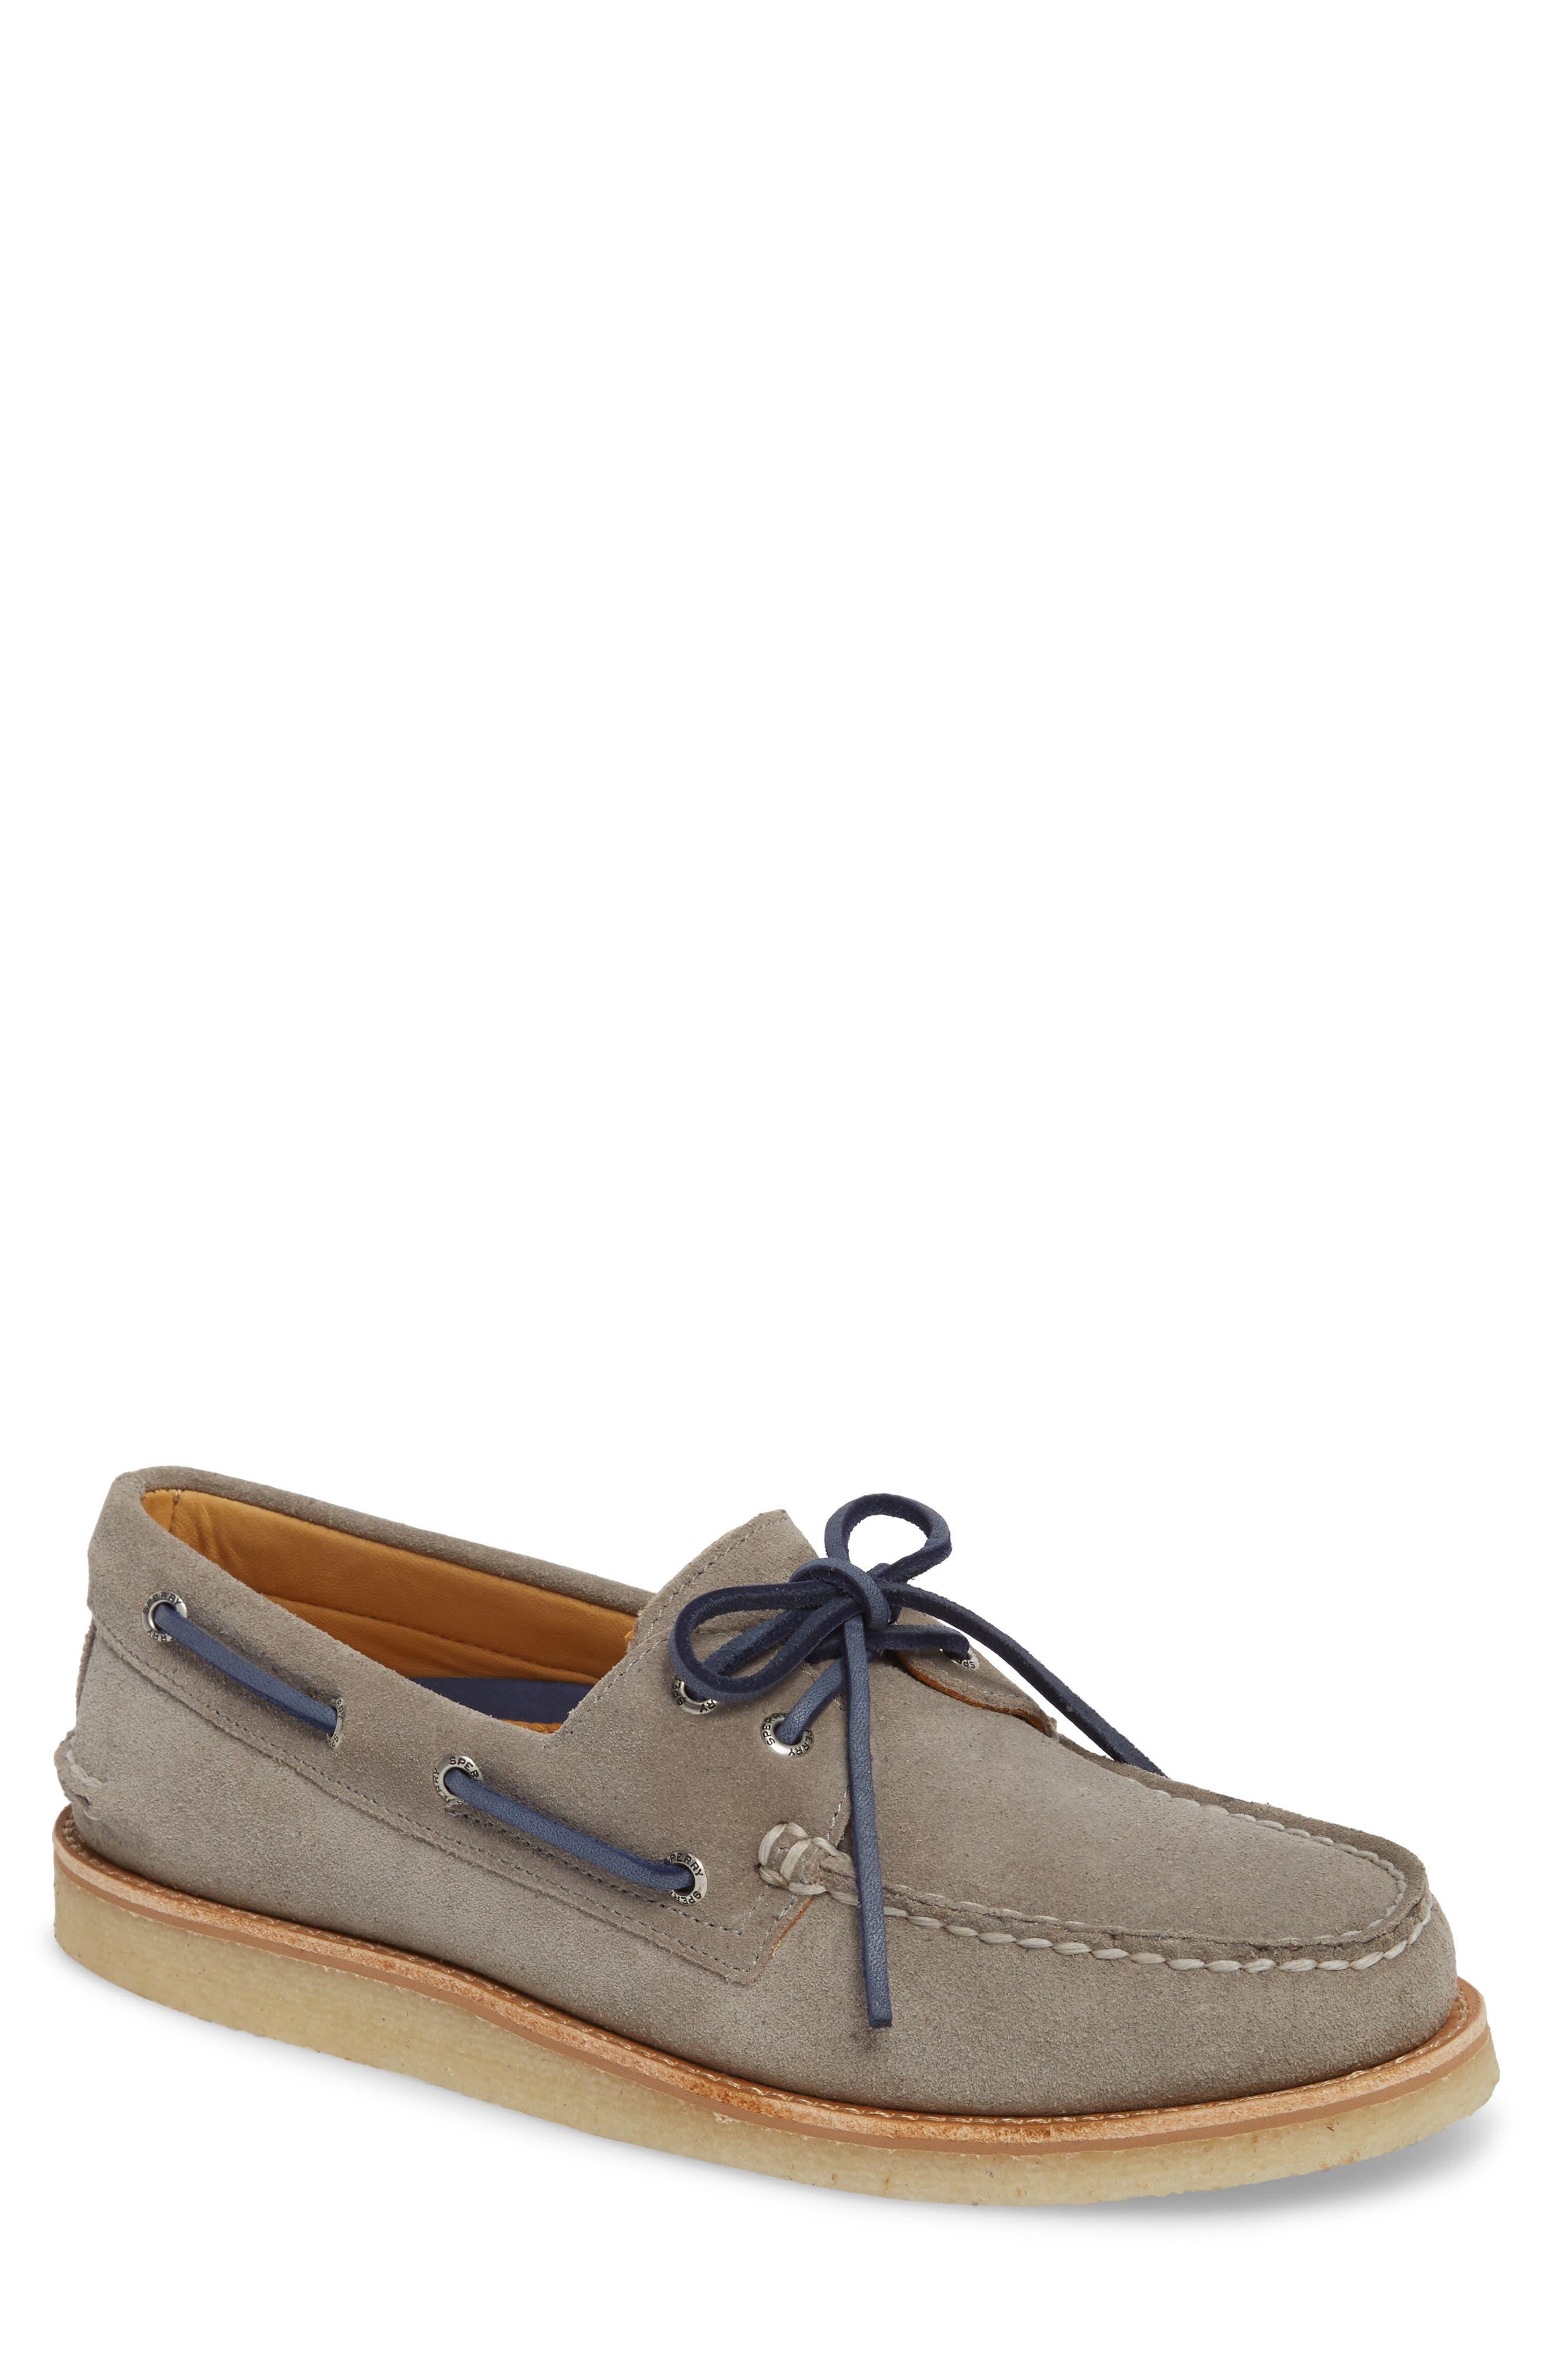 Sperry Gold Cup AO 2-Eye Boat Shoe (Men)